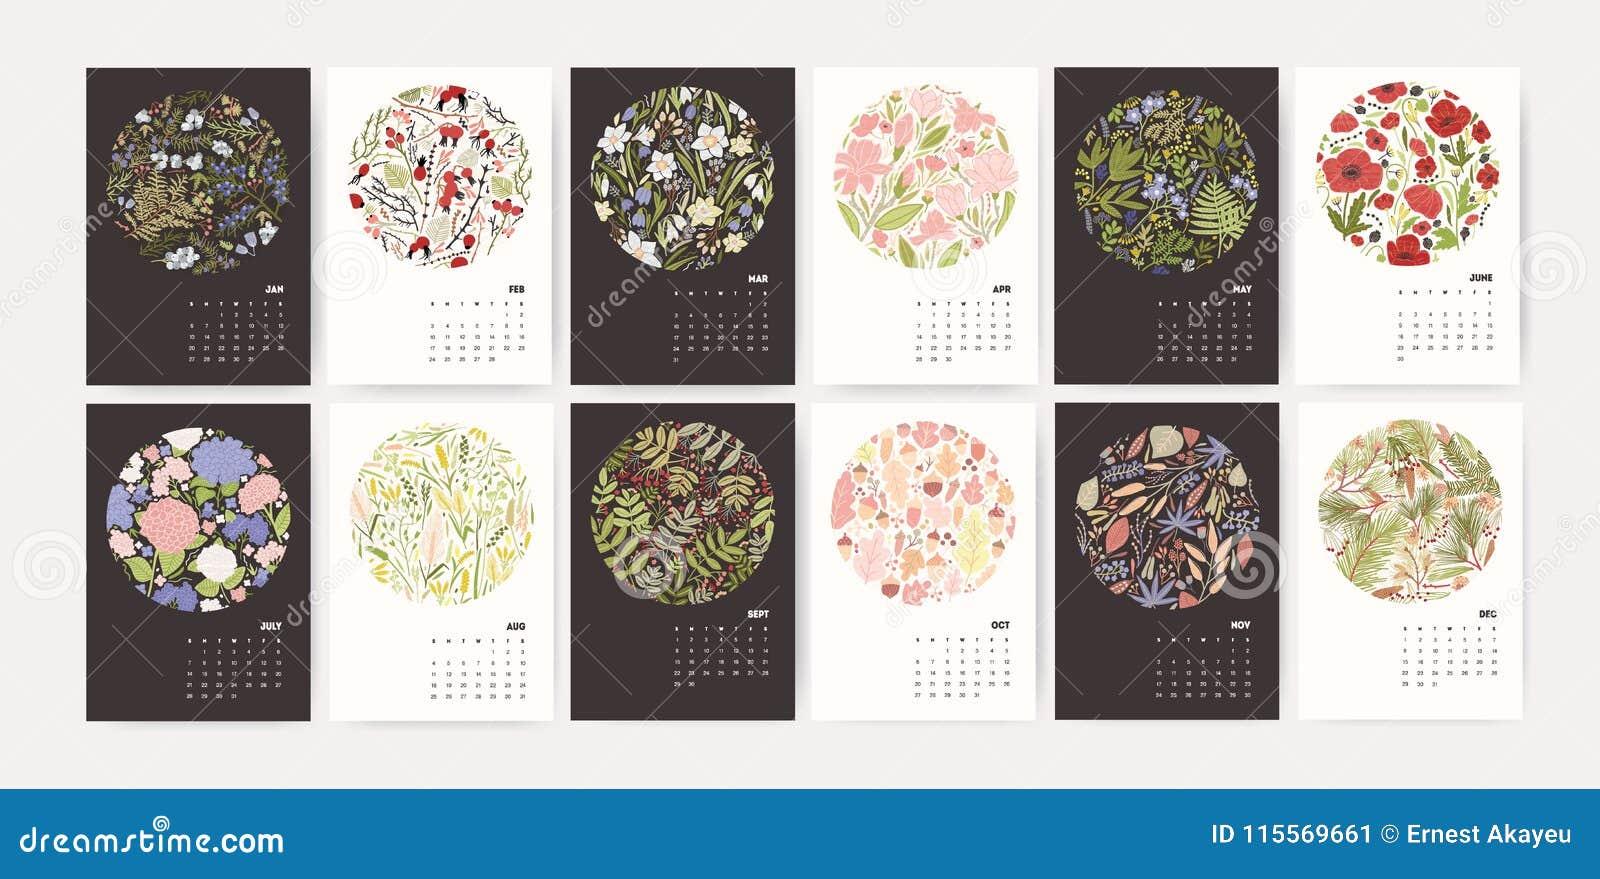 months of the year calendar